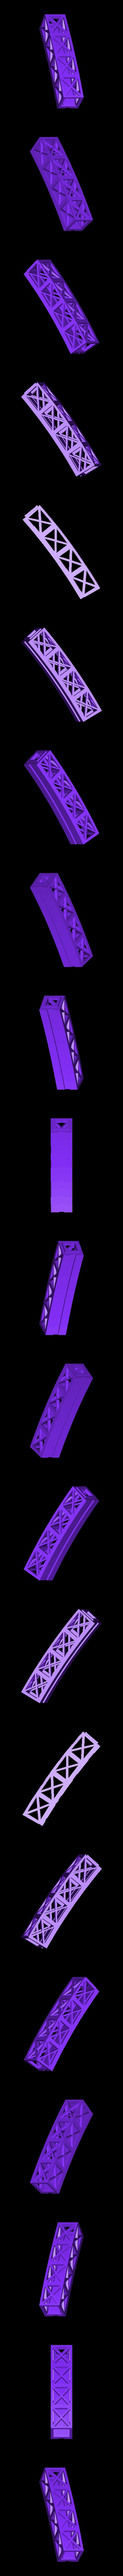 SEG_S-3.stl Download free STL file LED bridge lamp • Model to 3D print, Opossums